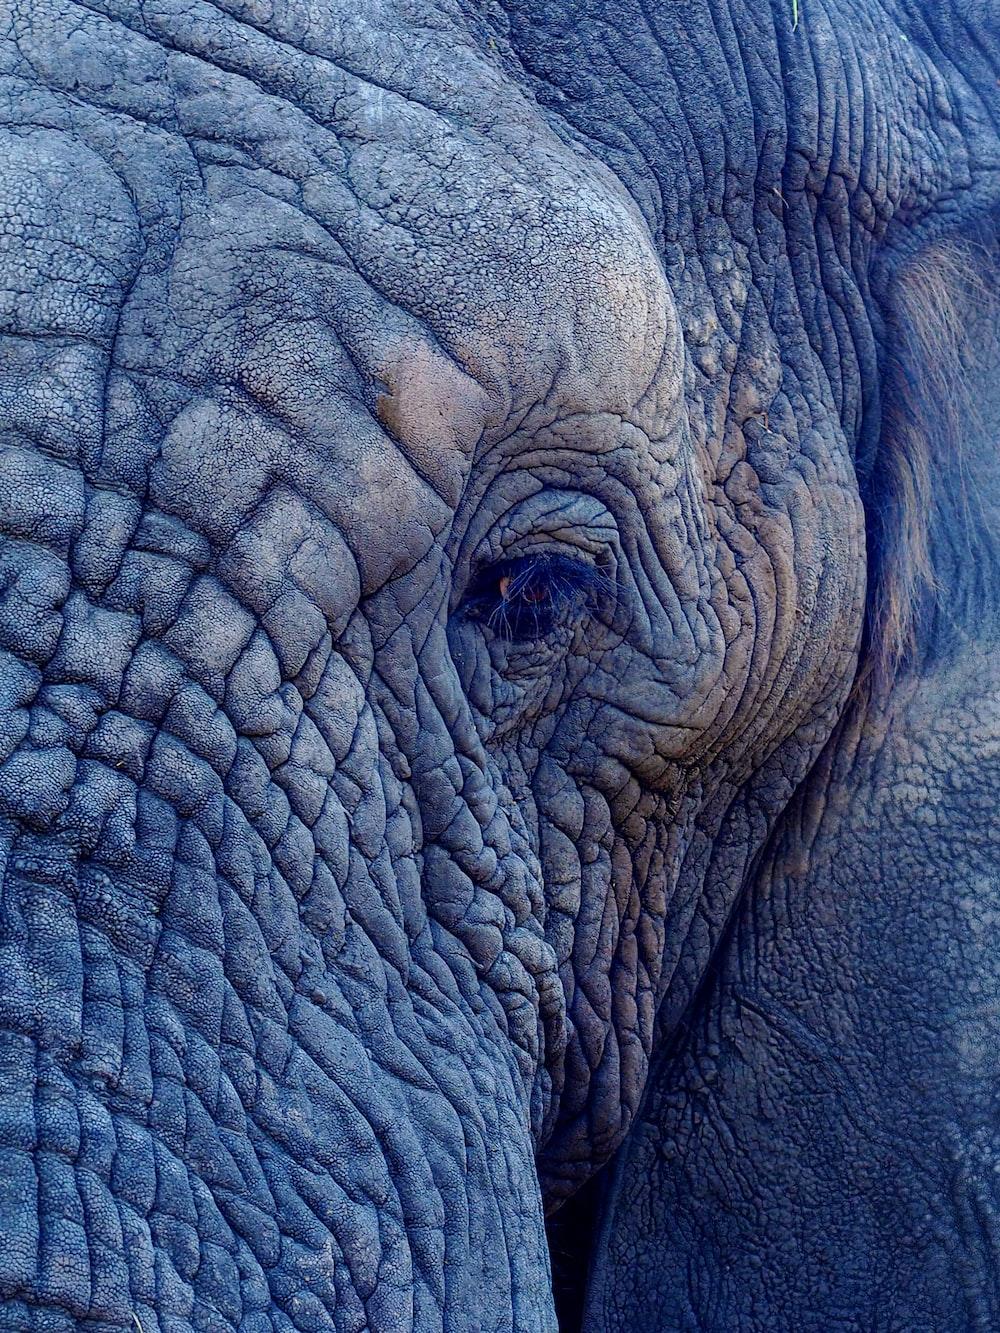 macro photography of elephant's face